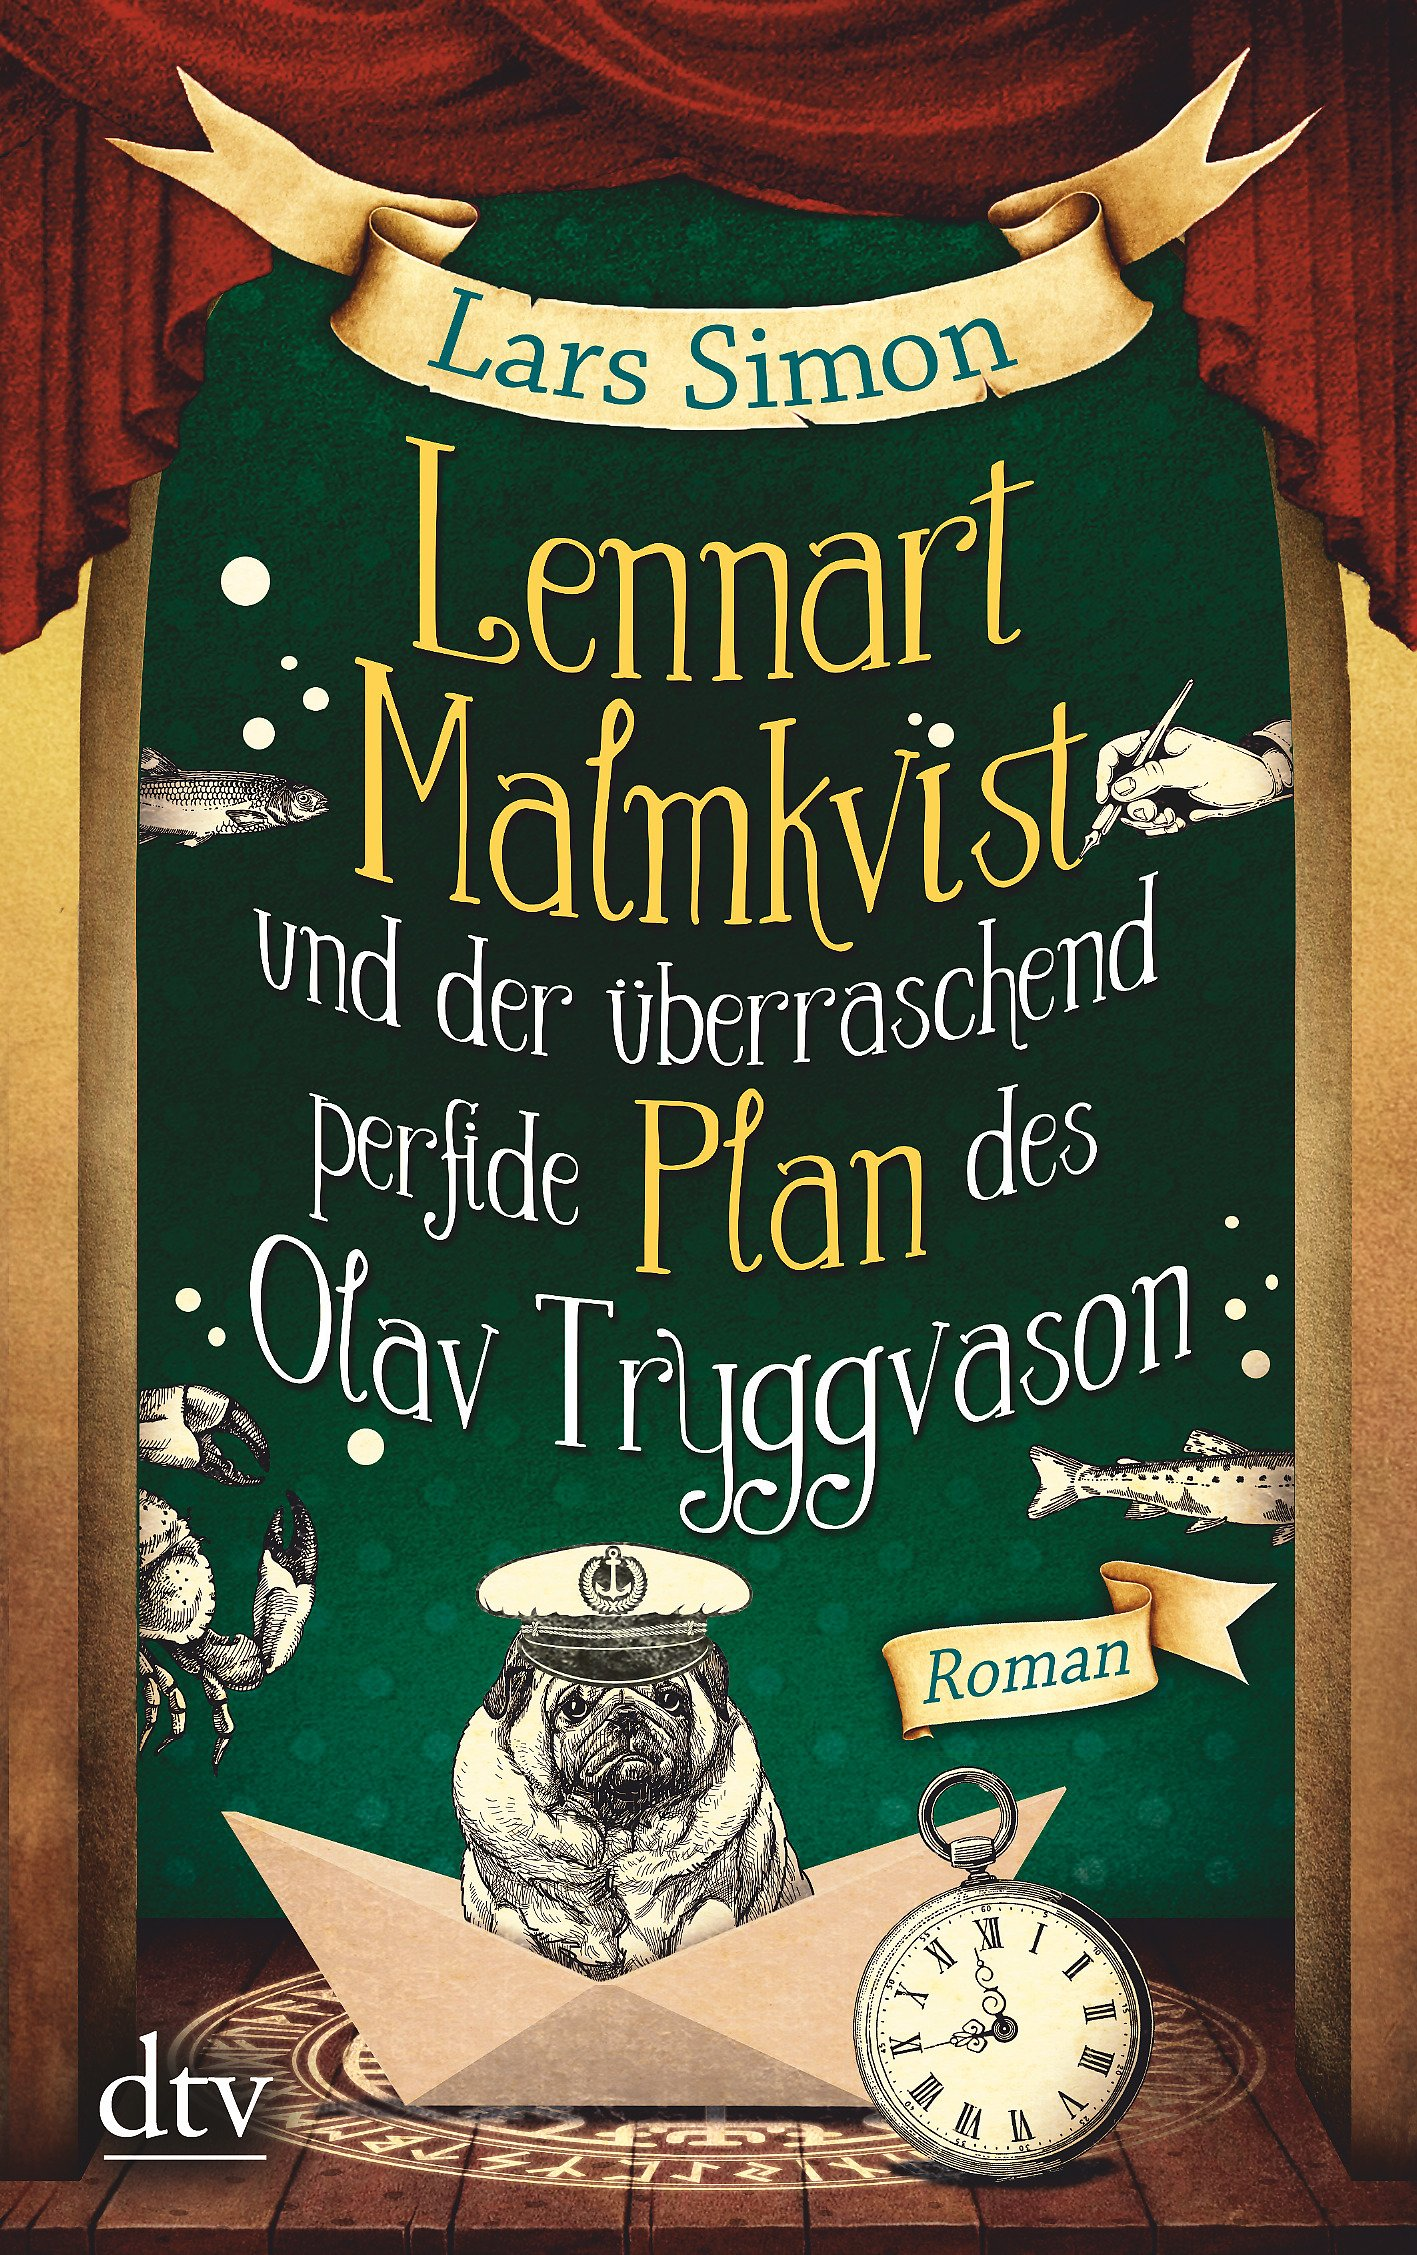 simon_lars_lennart_malmqvist3_phantastik-autoren-netzwerk.jpg